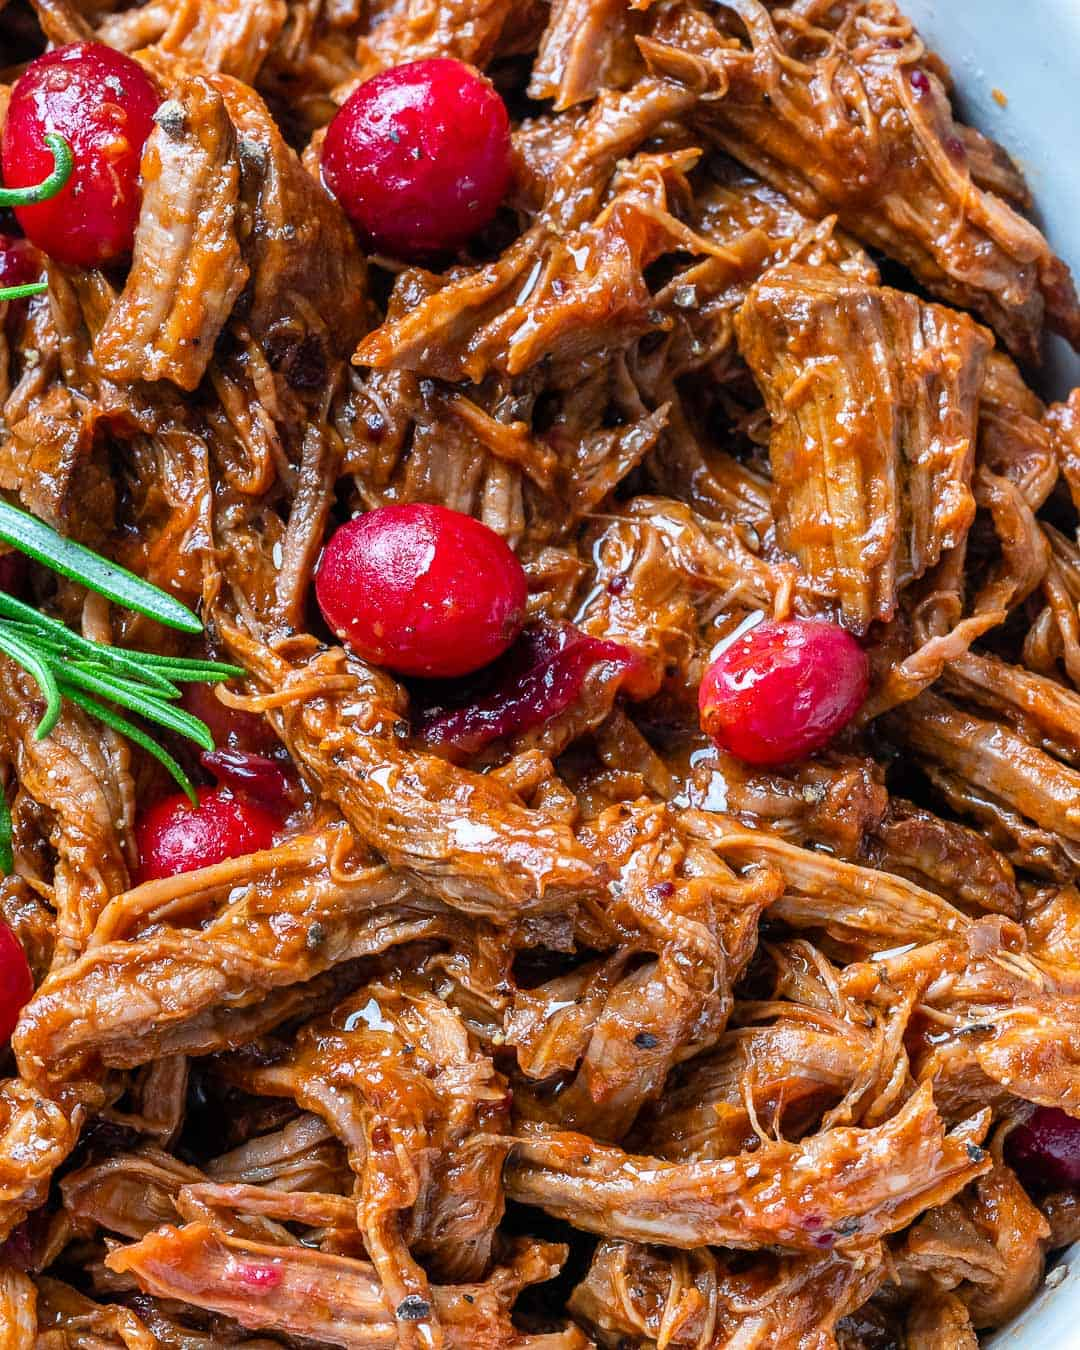 beef brisket recipe with cranberry